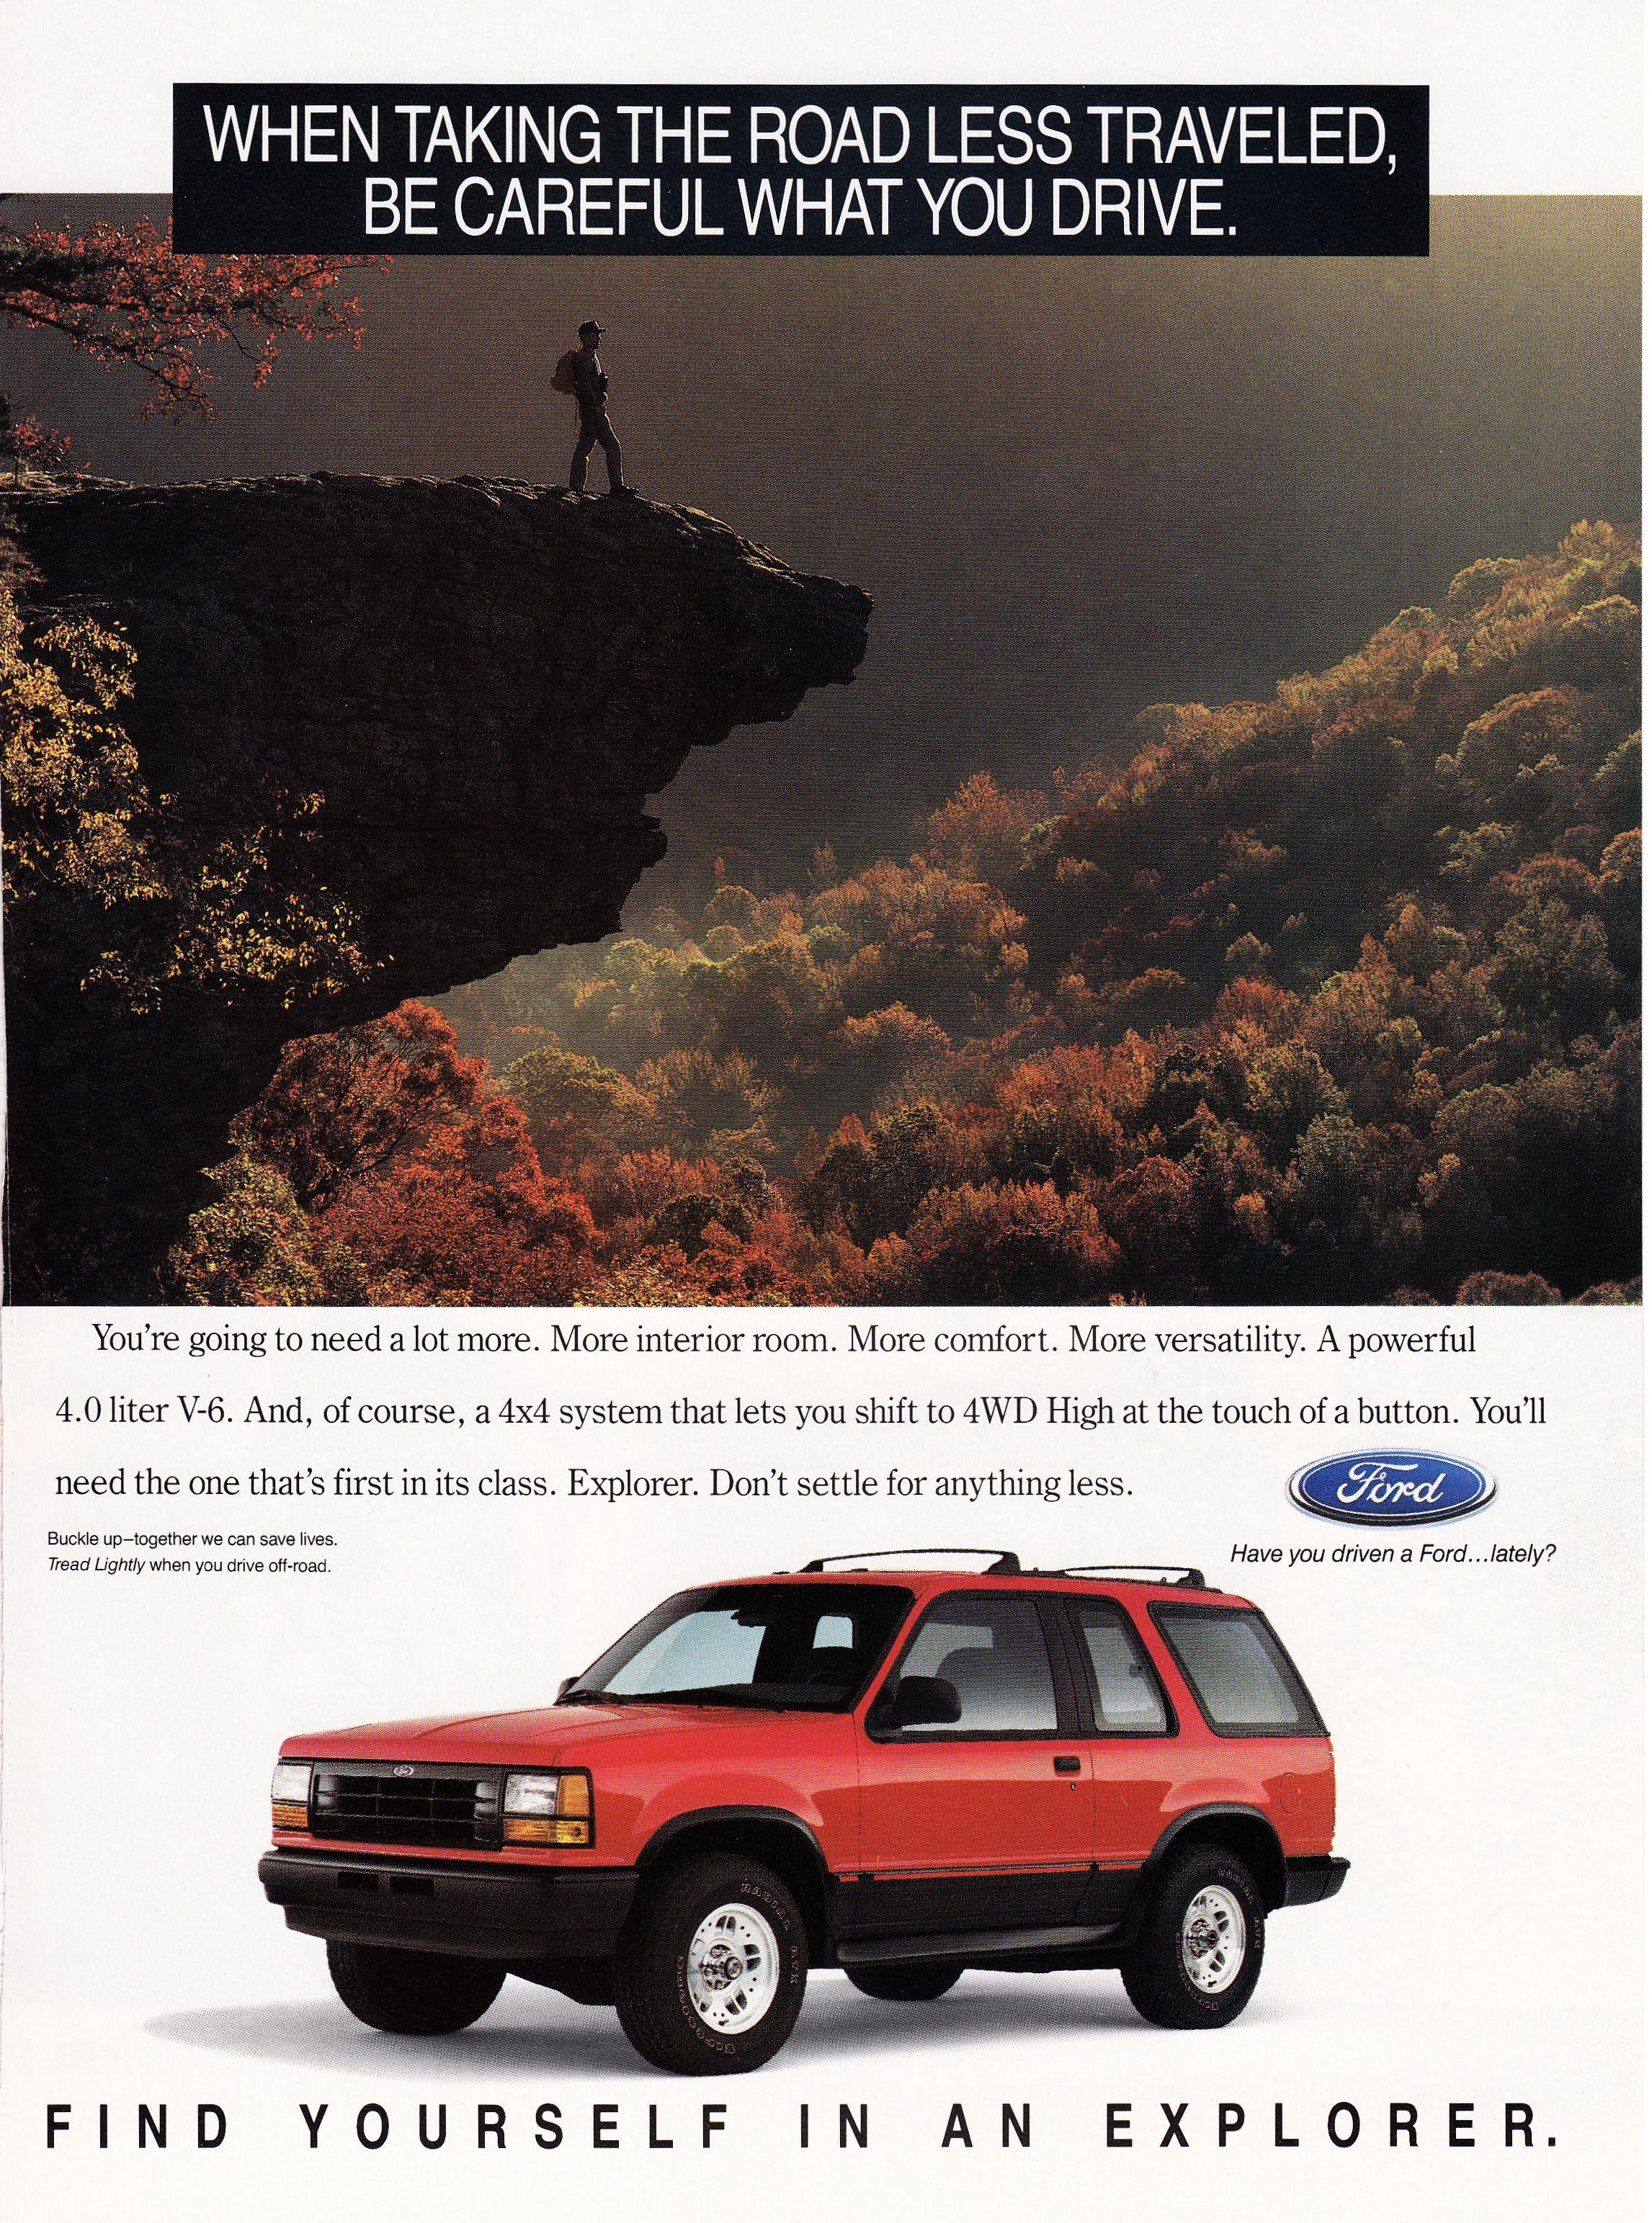 1993 Ford Explorer. Ford explorer, Explore, Vintage magazine